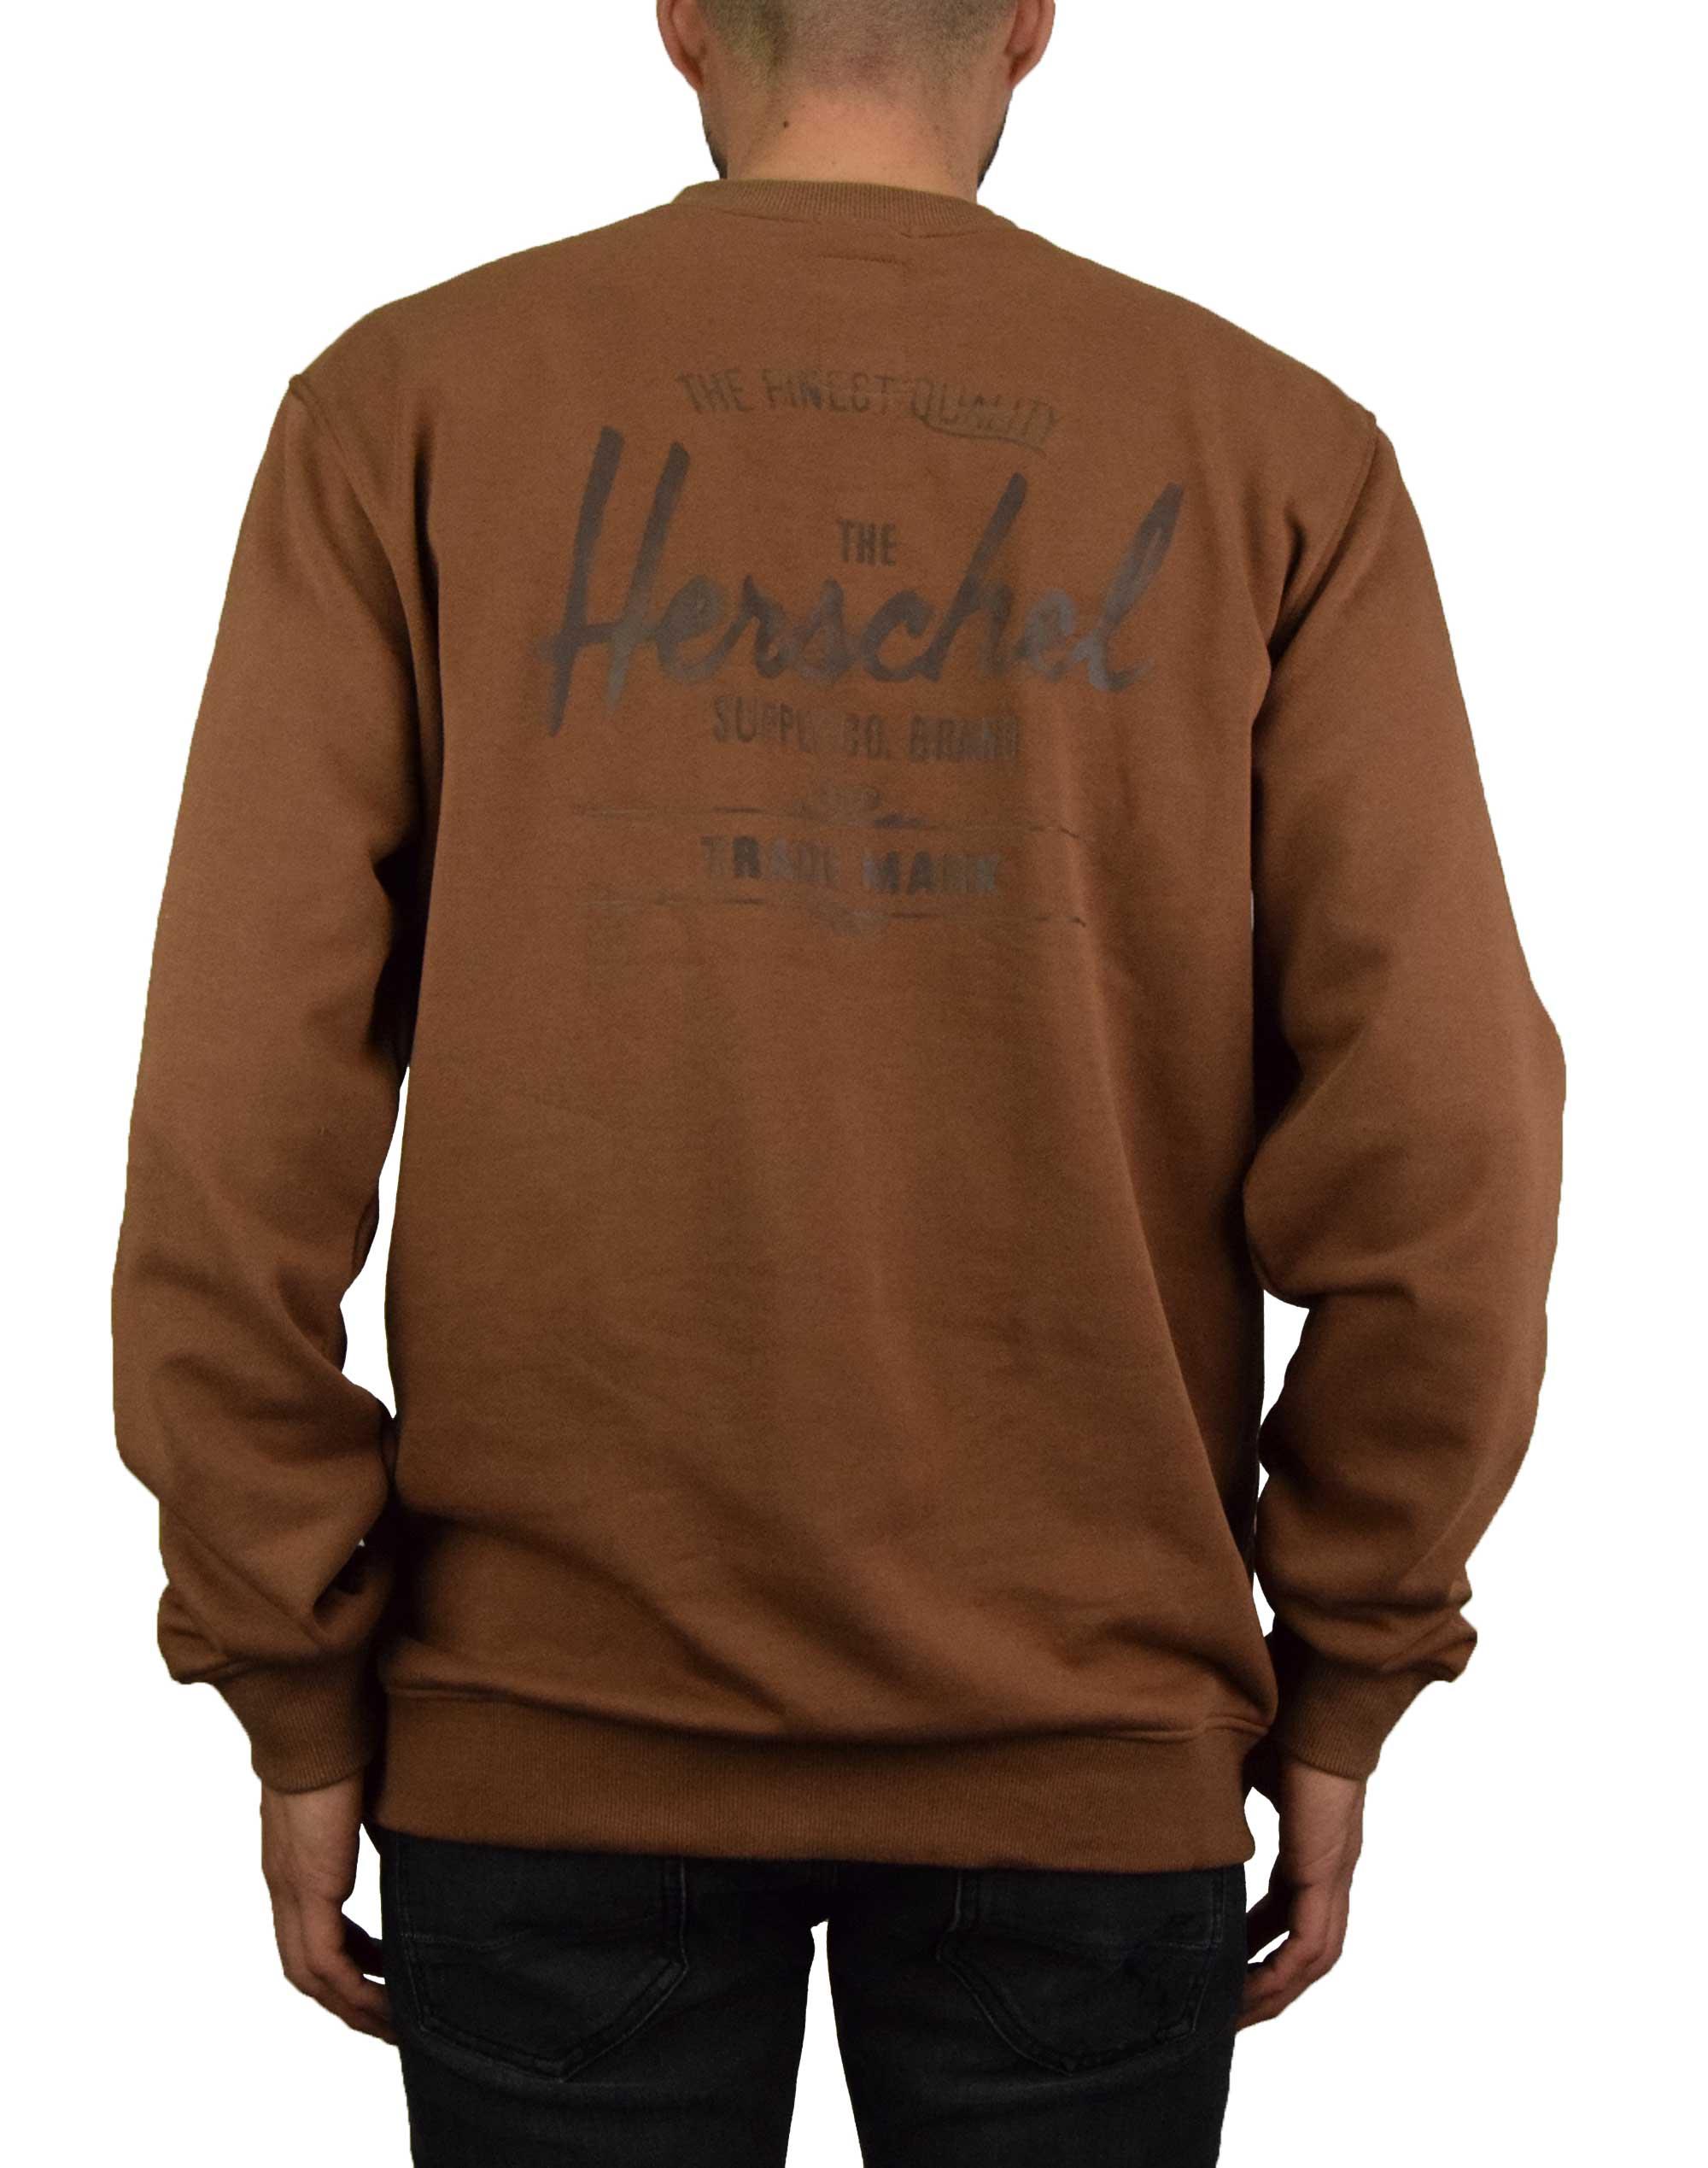 Herschel Supply Co Crewneck Classic Logo Tee (50032-00512) Saddle Brown